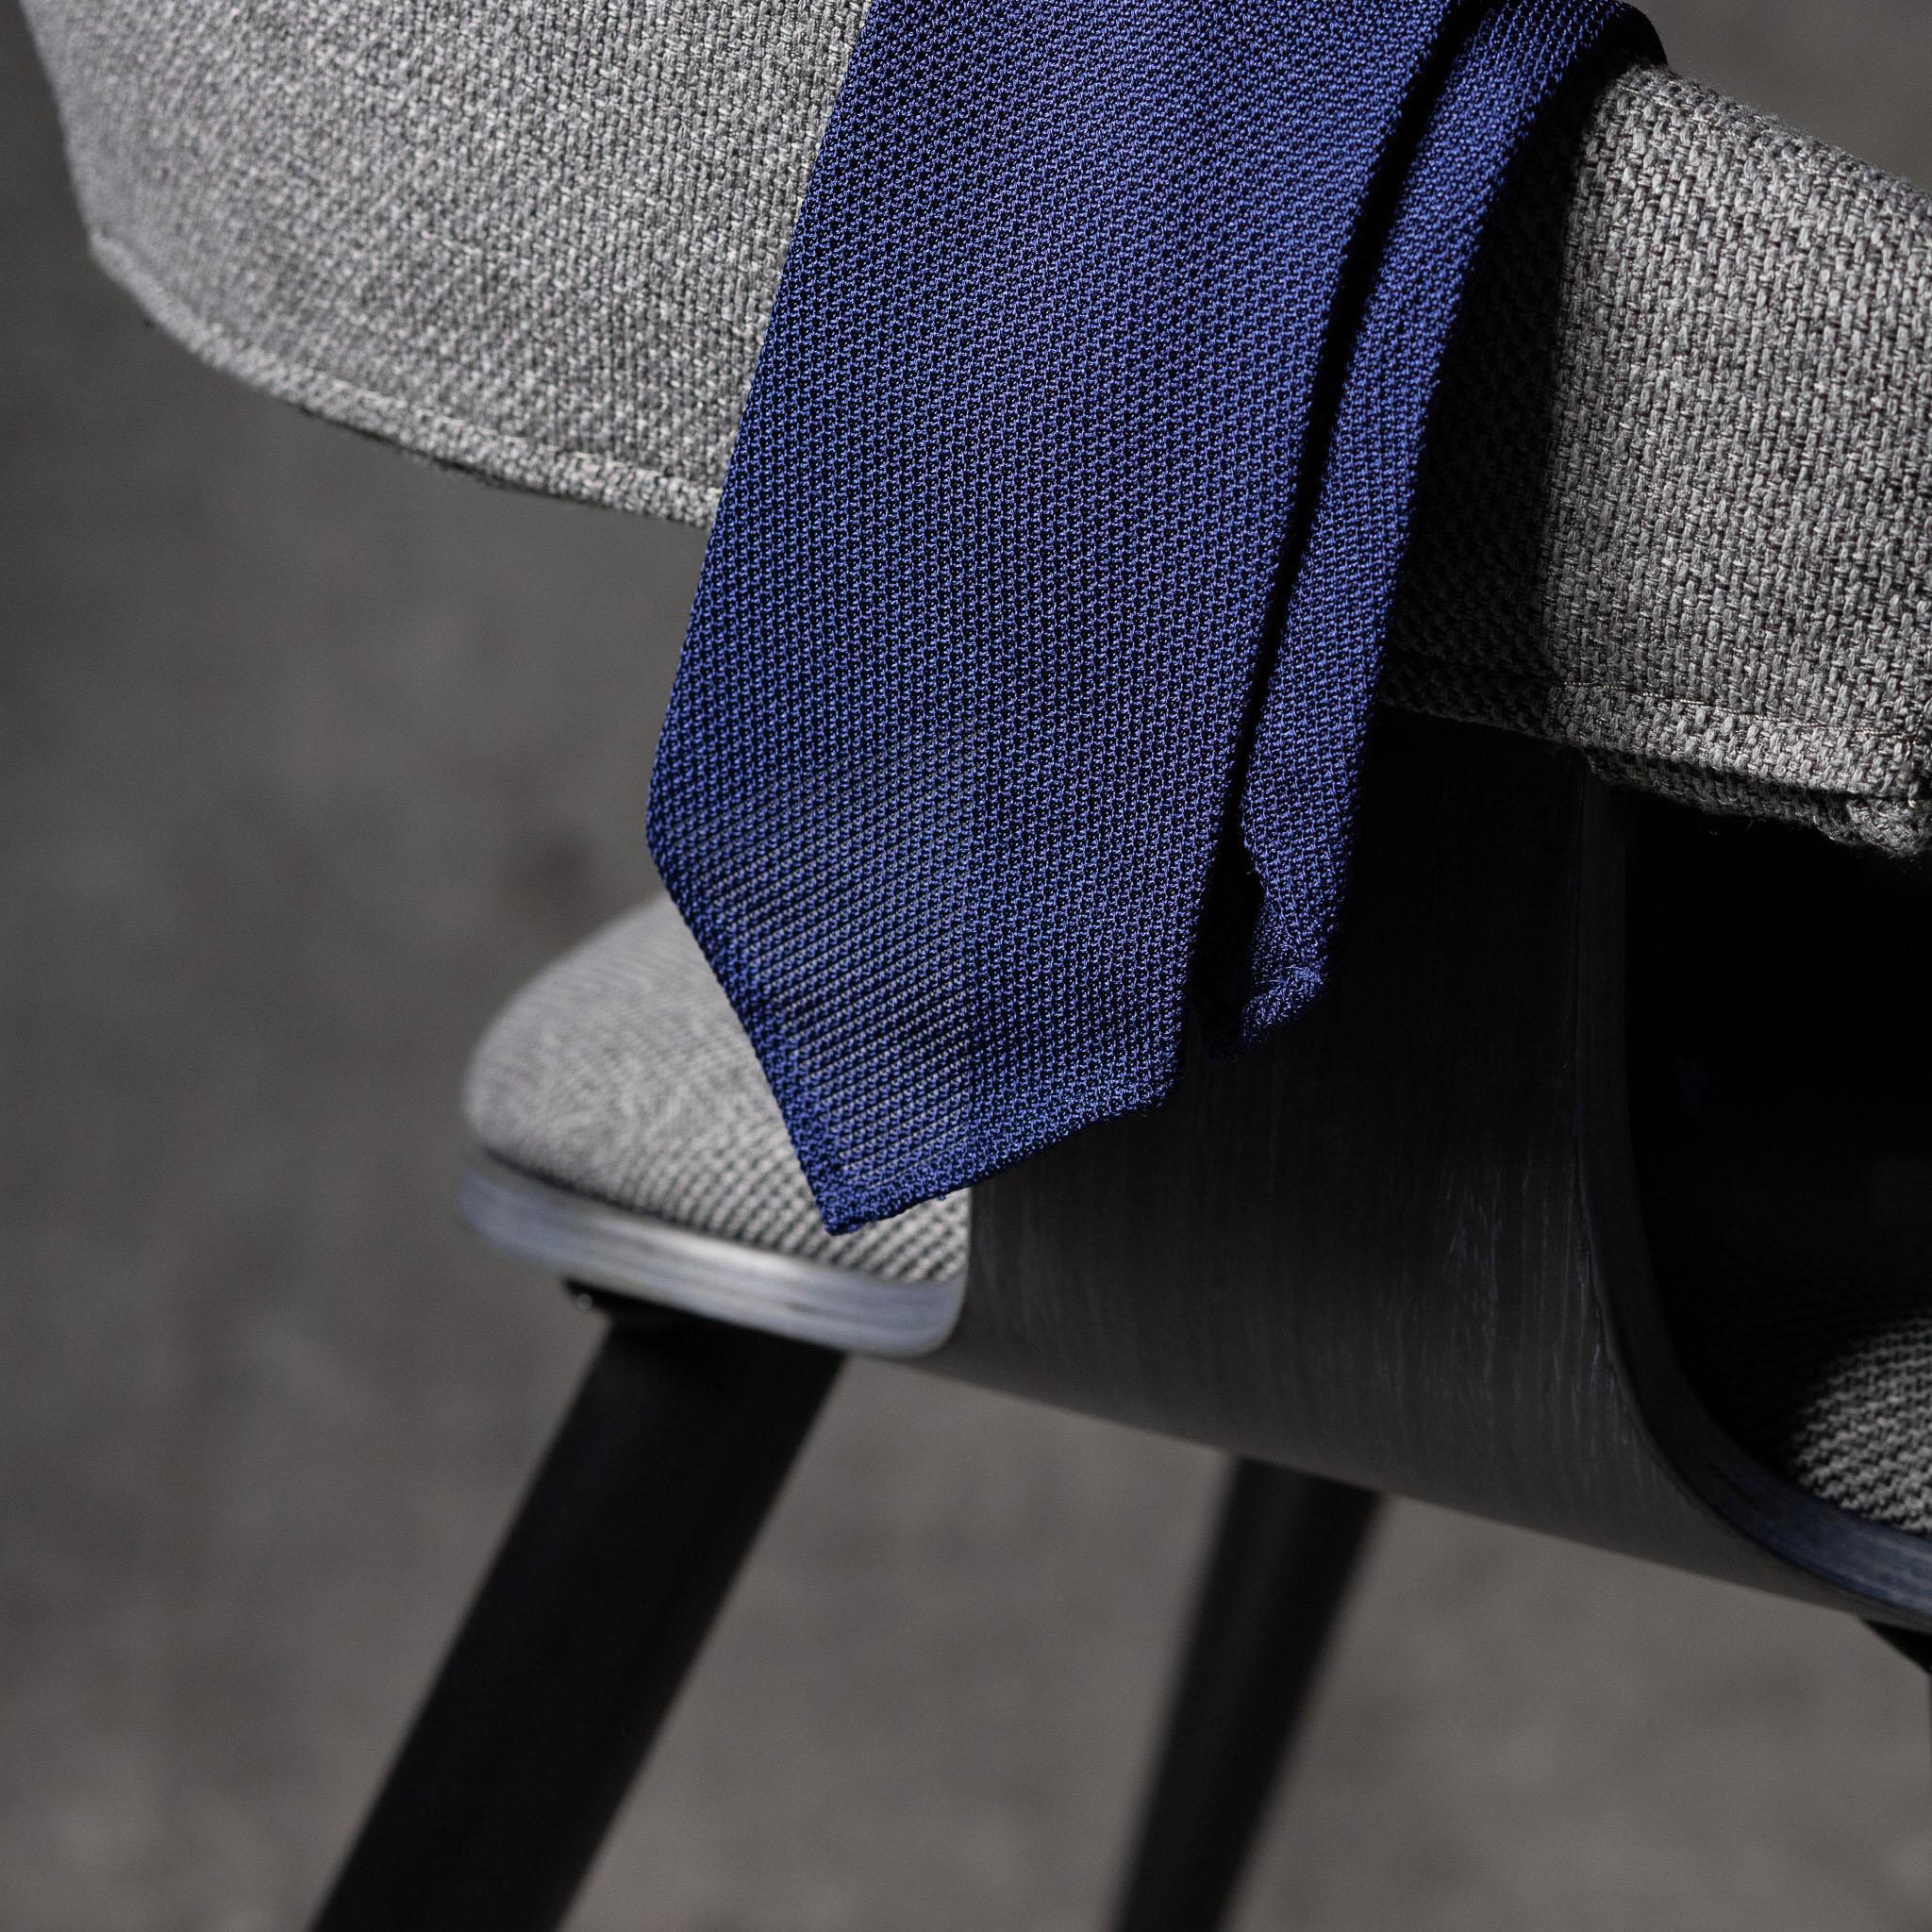 GRENADINE-0156-Tie-Initials-Corbata-Iniciales-The-Seelk-3